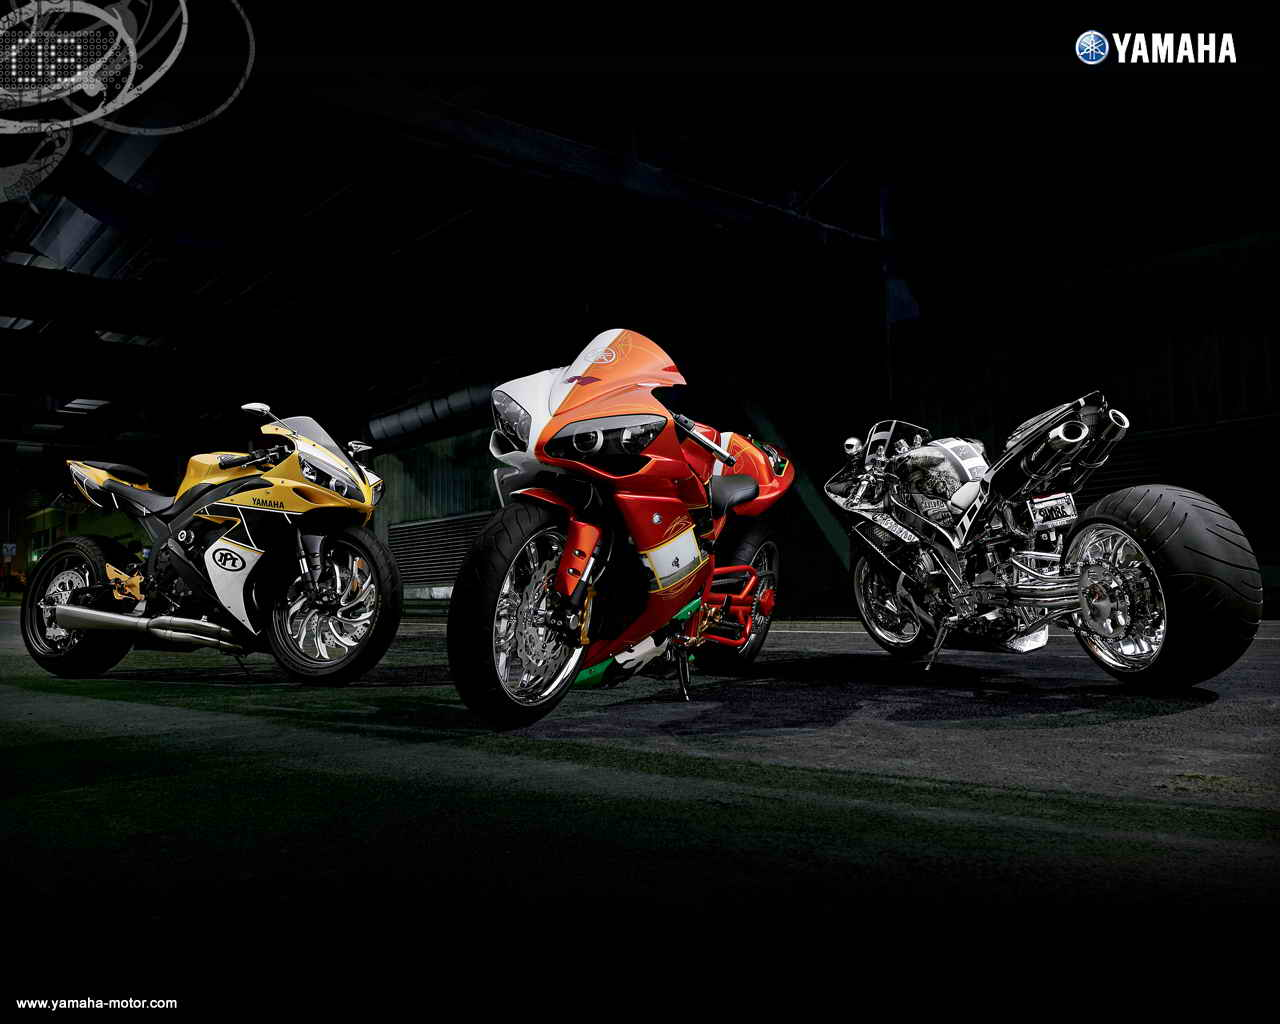 Motorcycle Modifications June 2010 All New Cbr 150r Racing Red Banyumas 3 Motorsport Yamaha R1 Custom